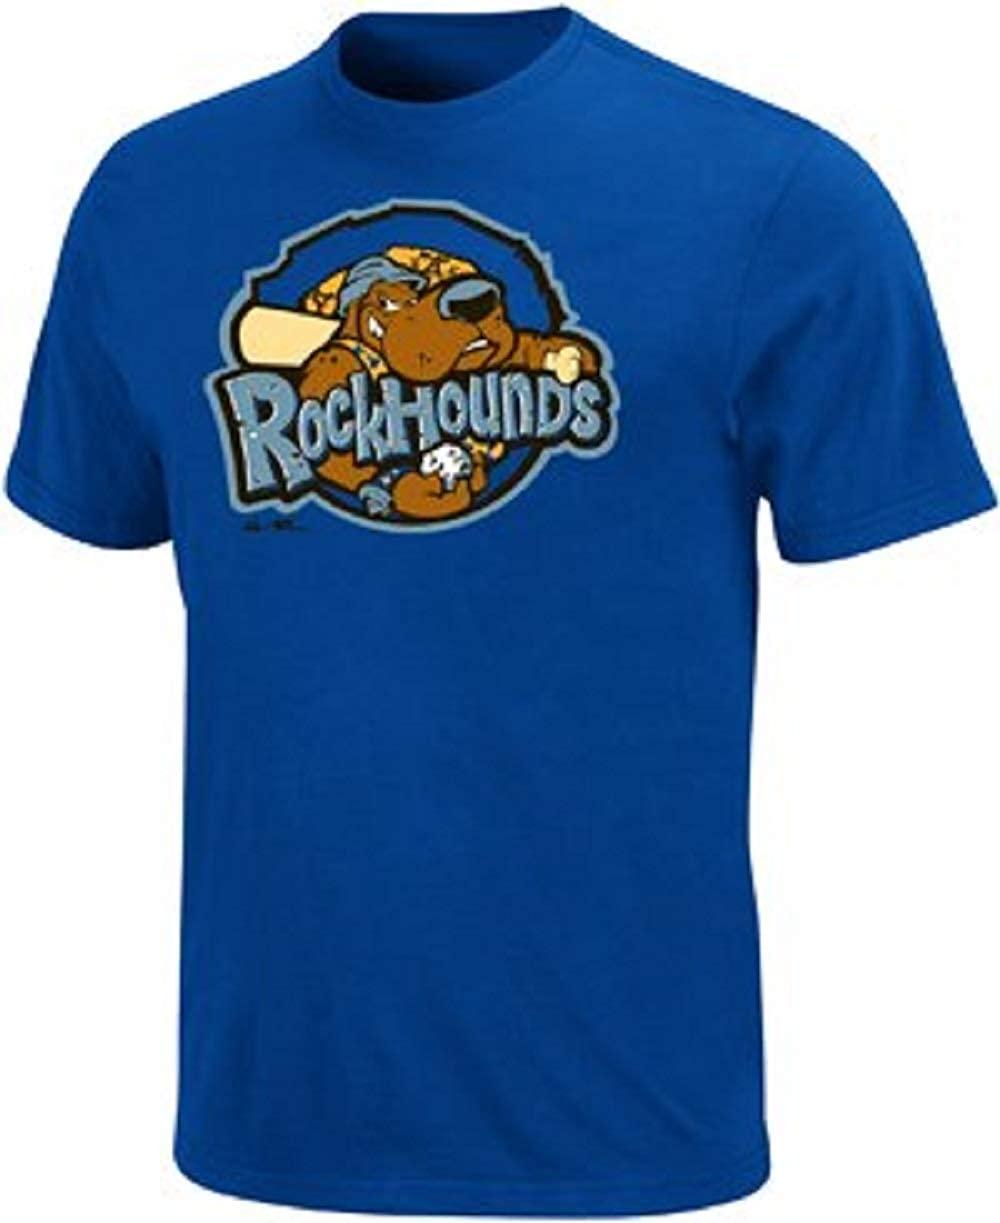 Majestic Minor League Midland Rockhounds T-Shirt Style Jersey